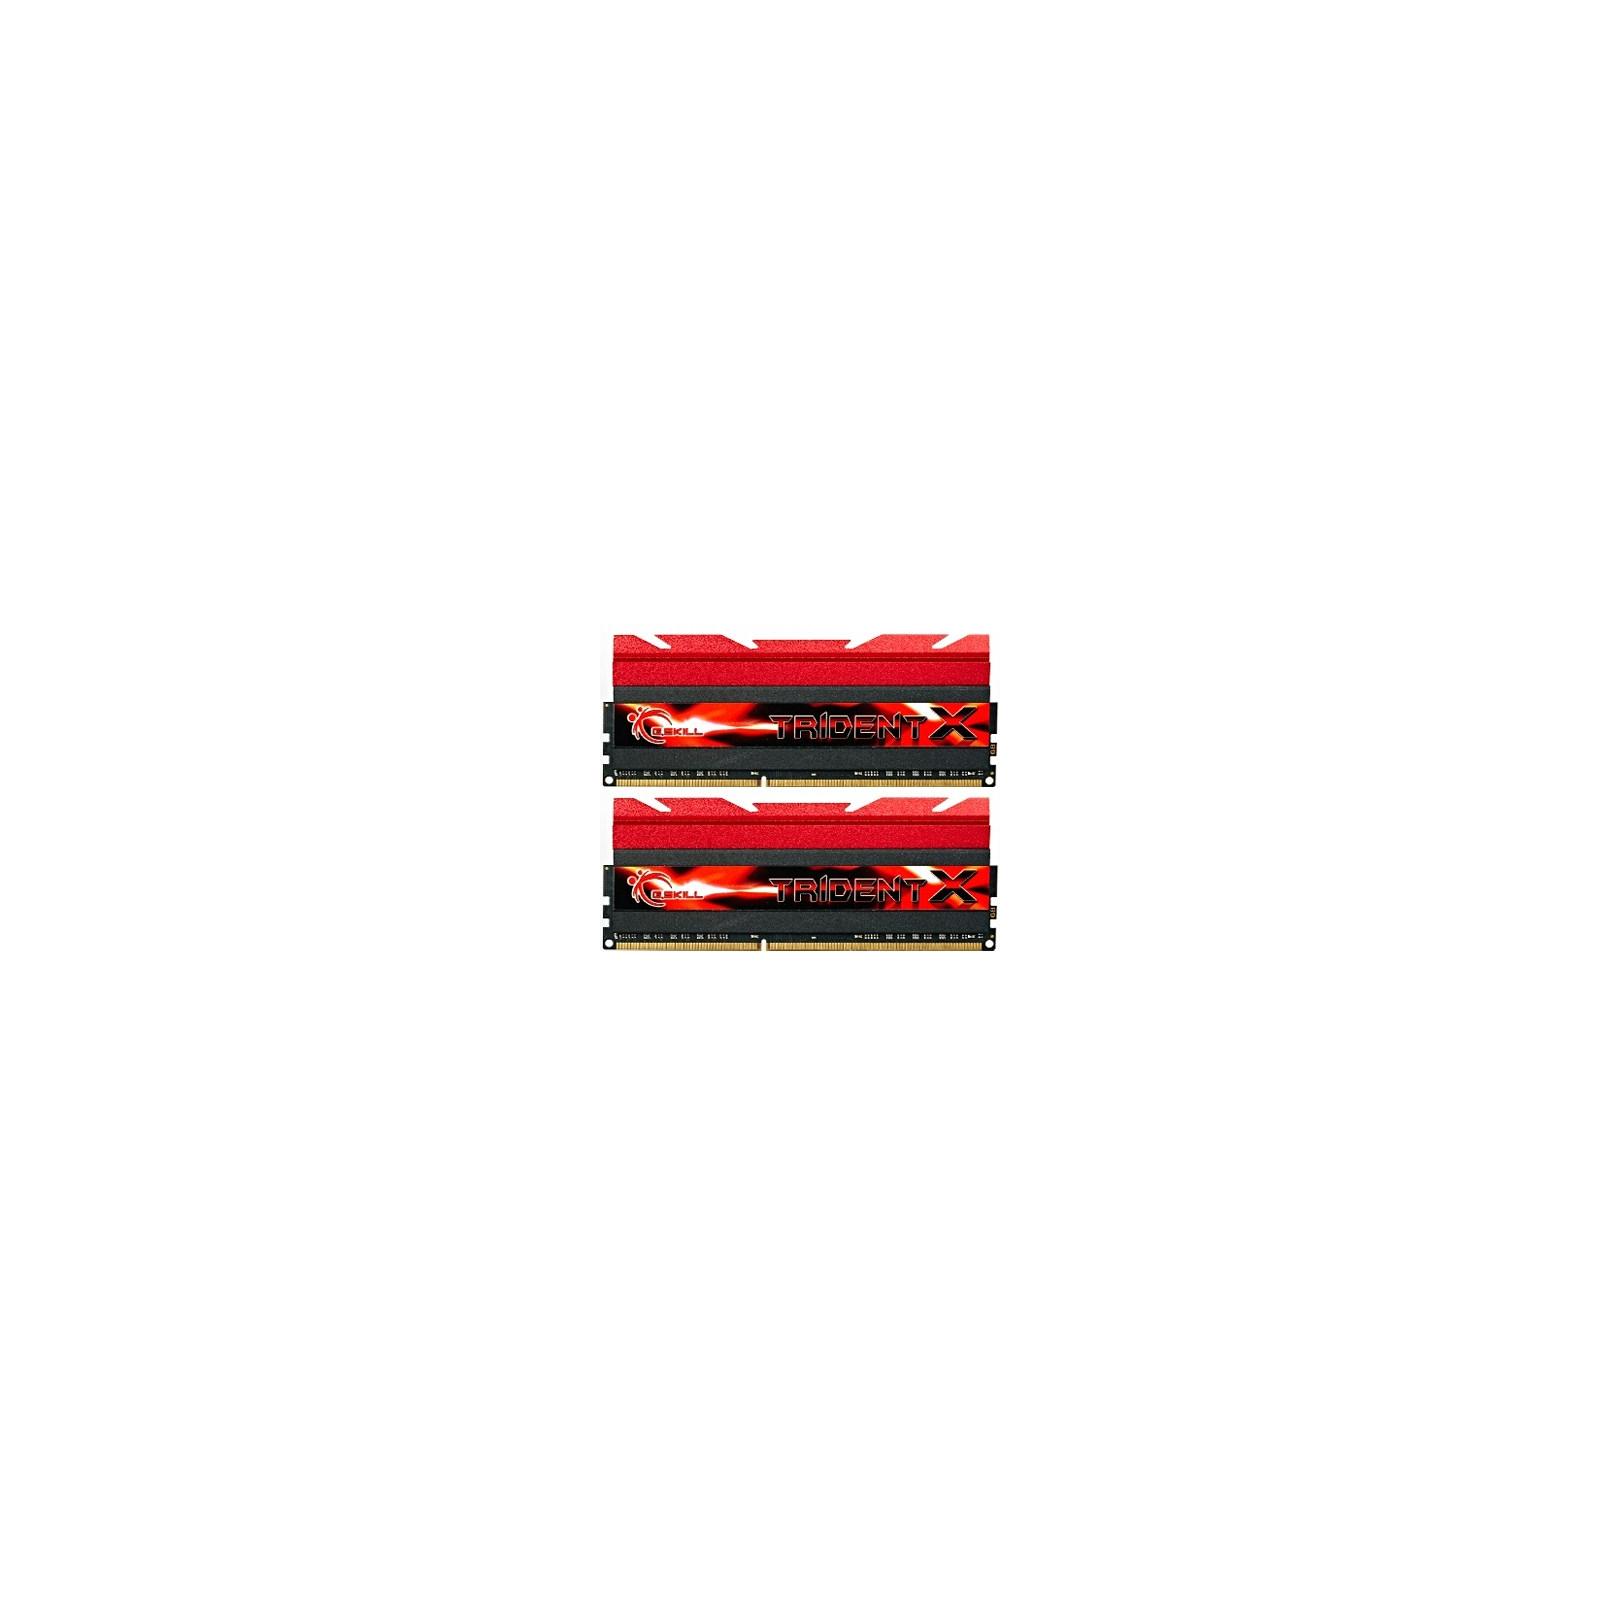 Модуль памяти для компьютера DDR3 16GB (2x8GB) 1866 MHz G.Skill (F3-1866C8D-16GTX)